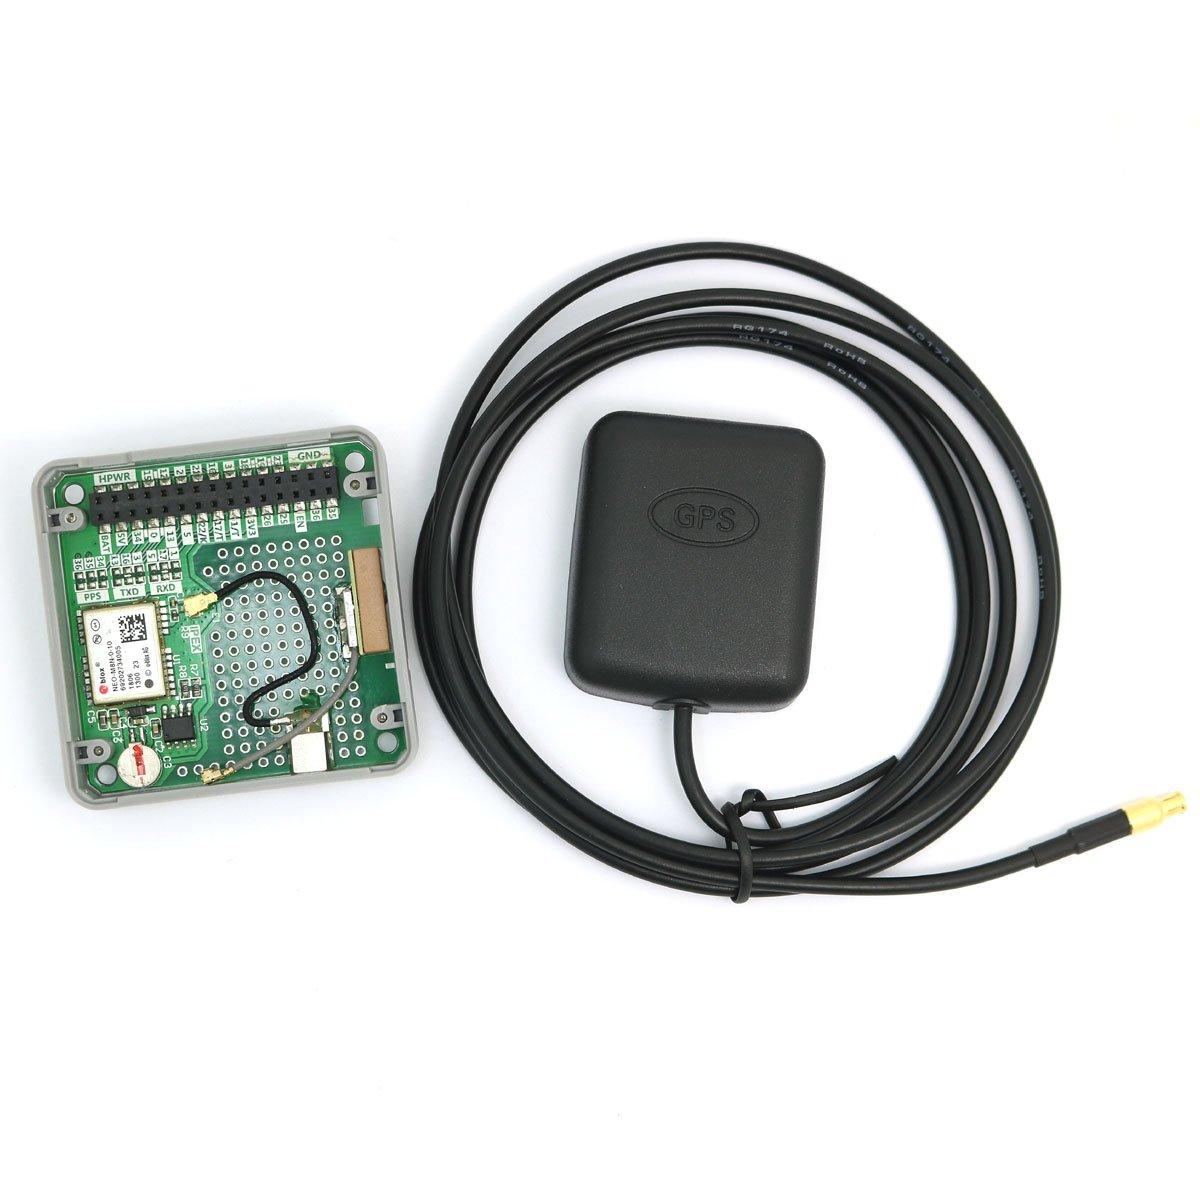 Módulo GPS WINGONEER M5Stack ESP32 Módulo GPS NEO M8N incorporado con interfaz MCX y antena GPS IoT apilable incluido pa